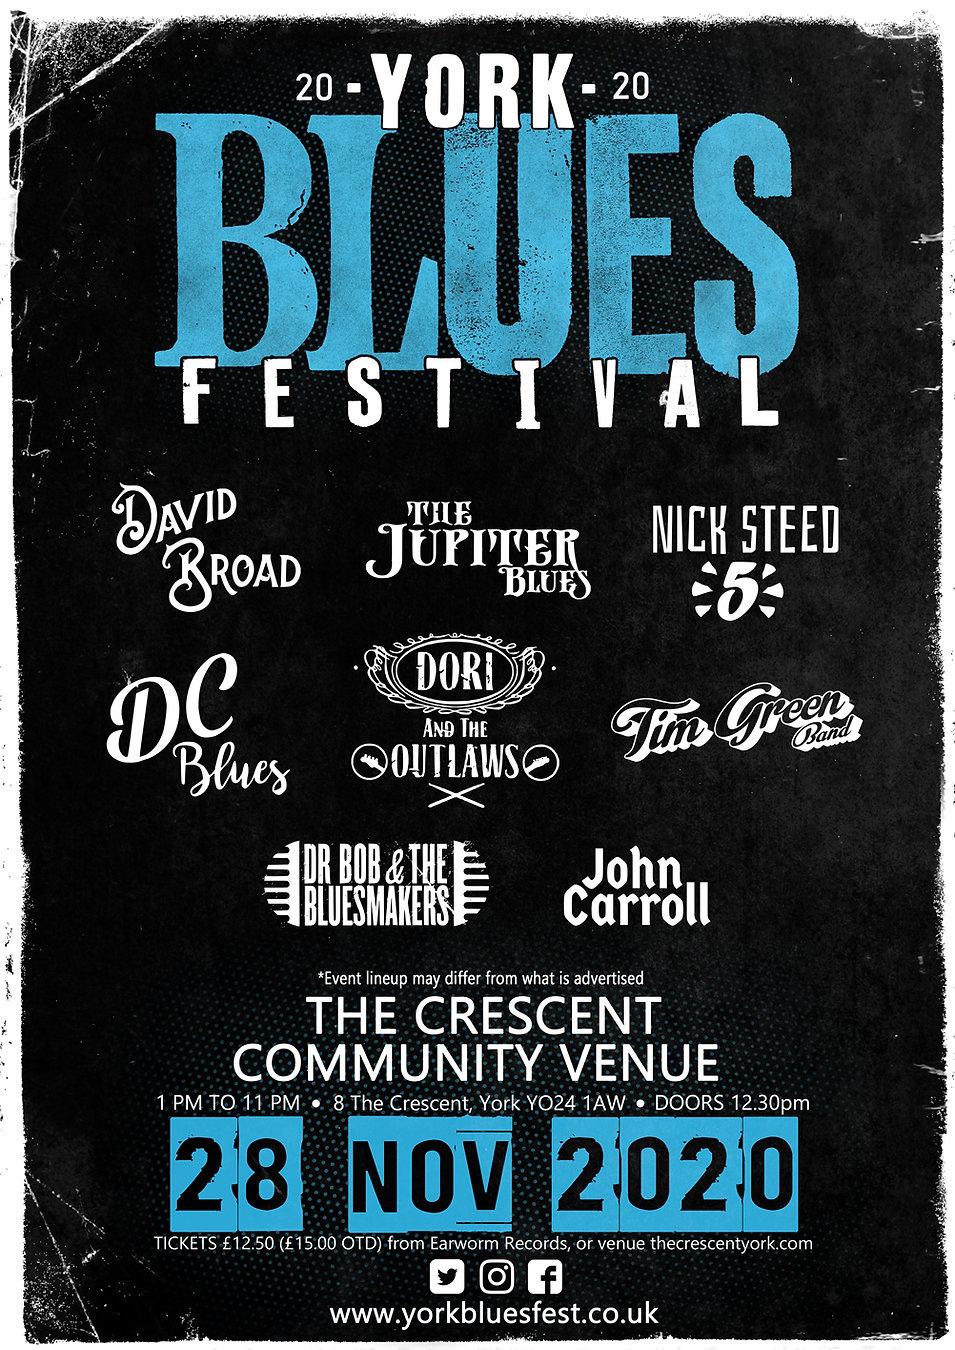 york blues fest 3 medium.jpg